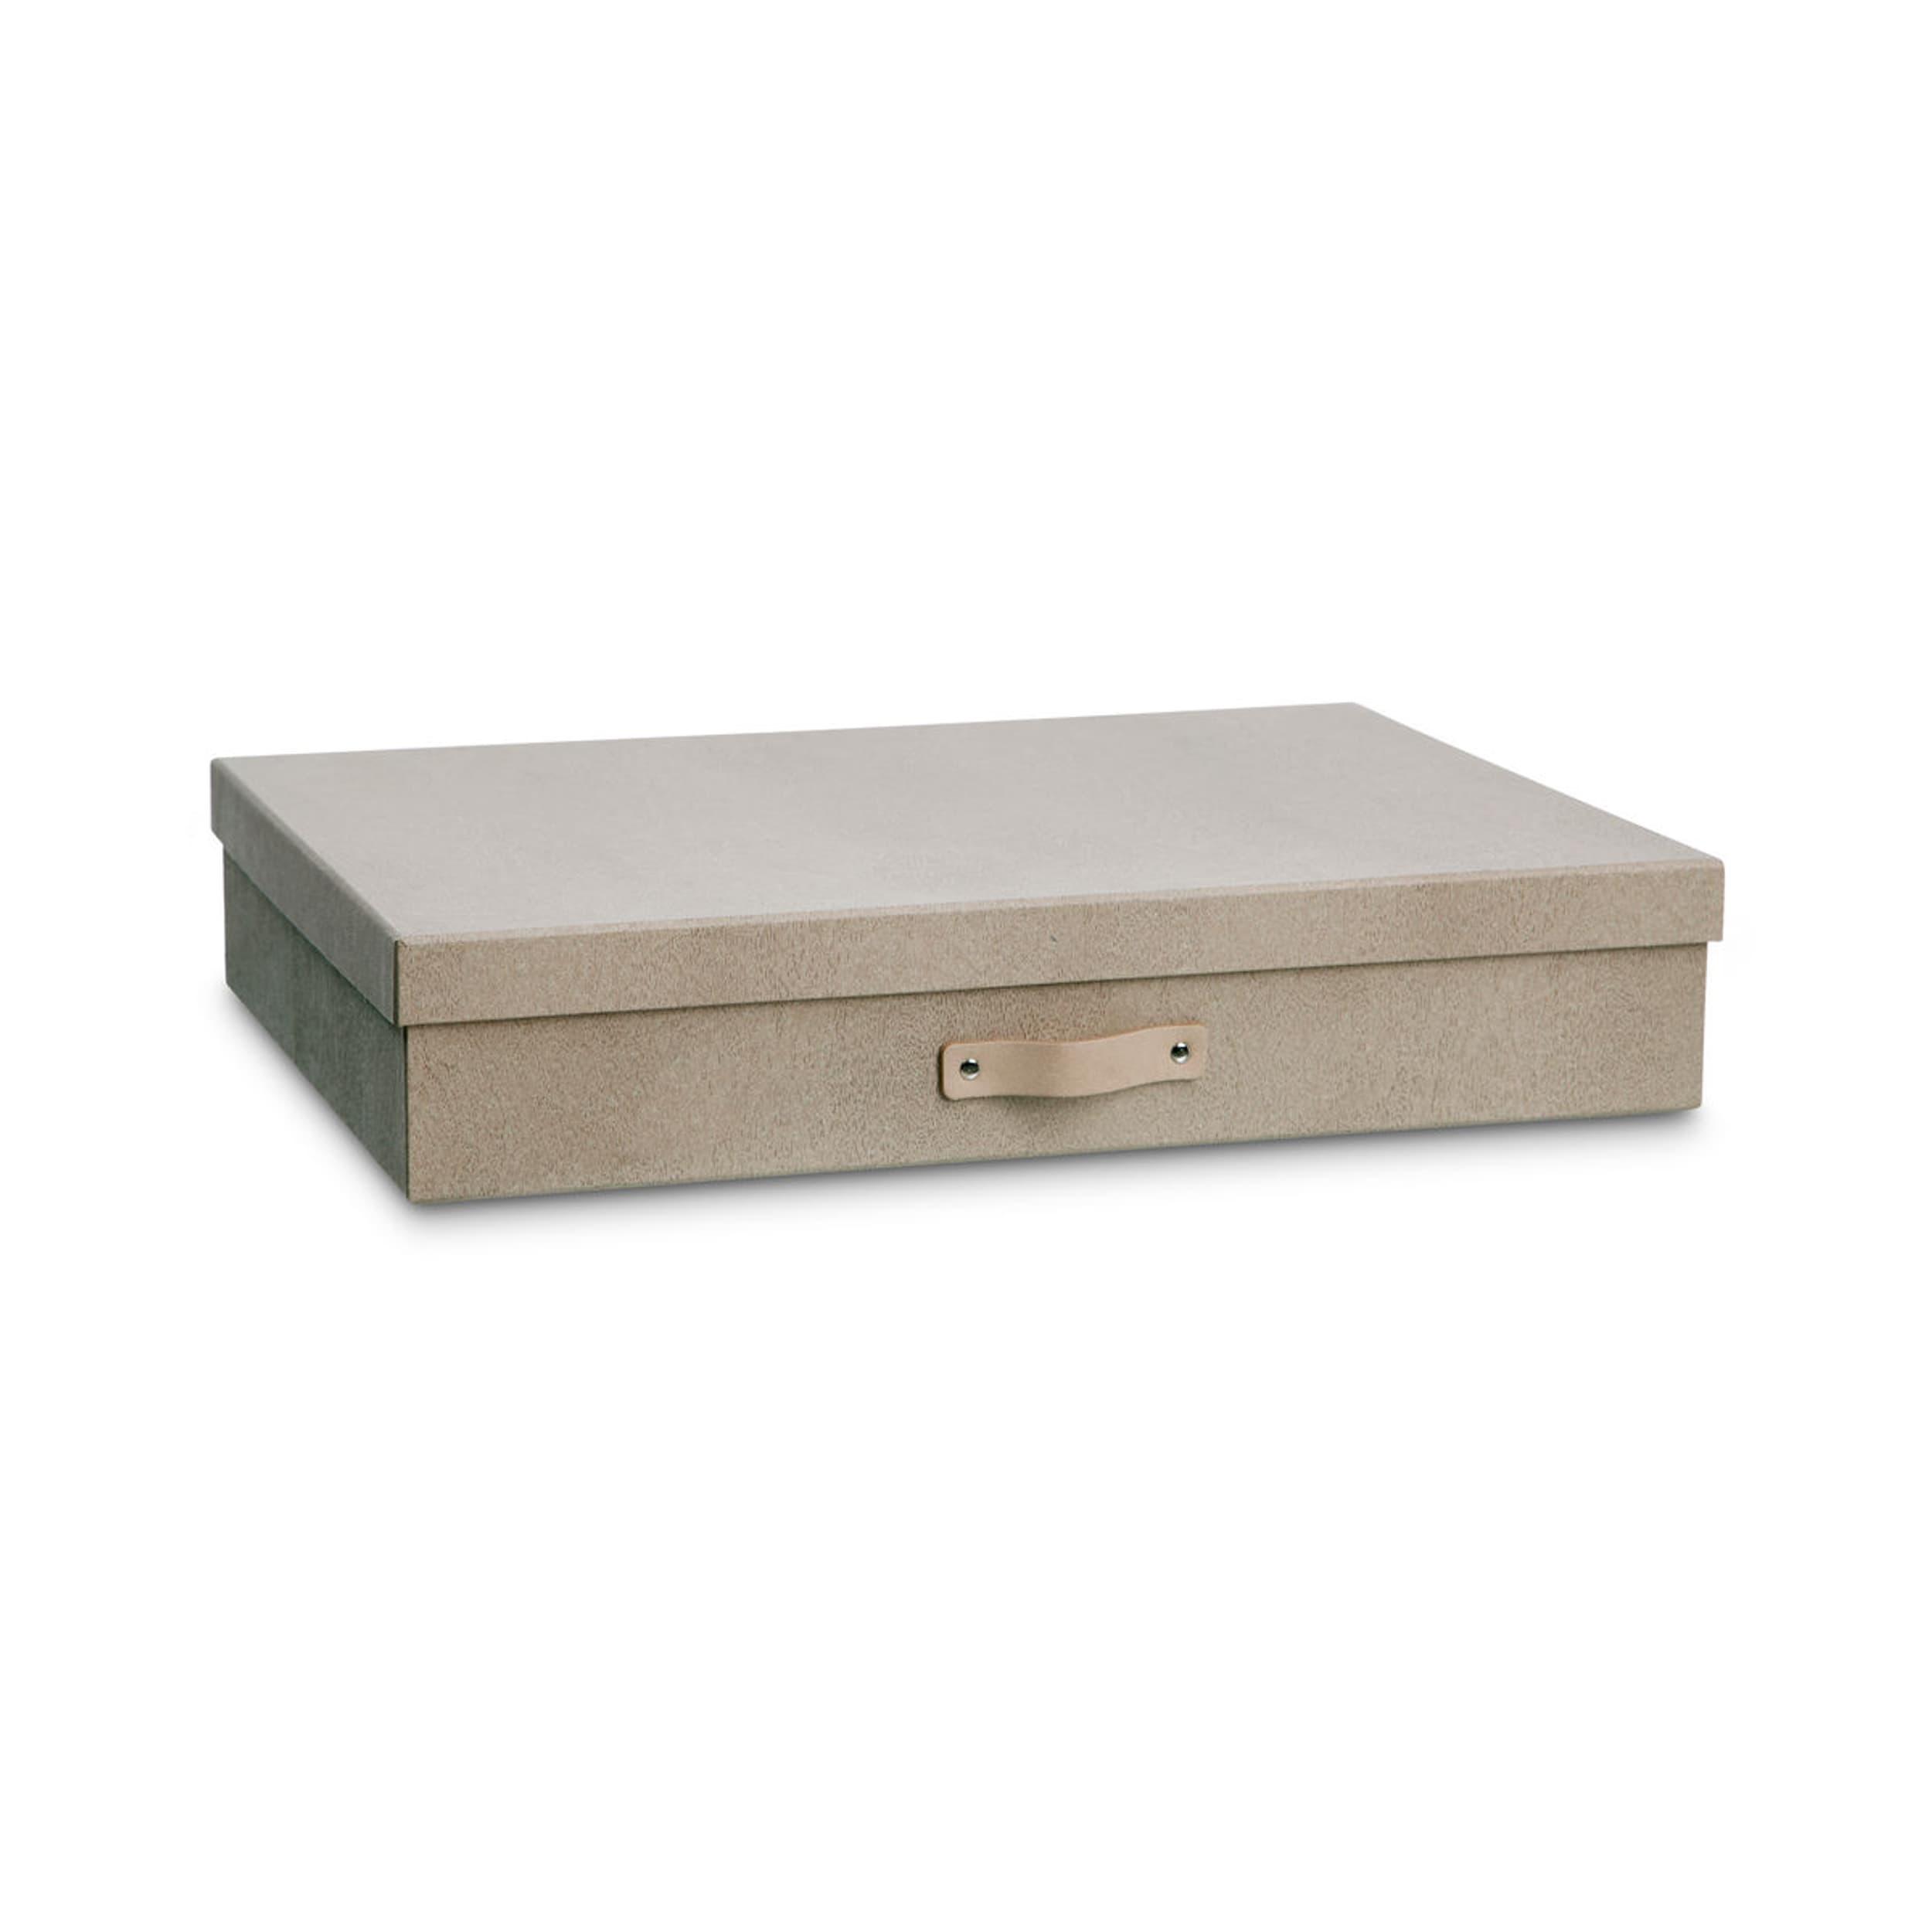 Image of Box A3 BIGSO WOOD